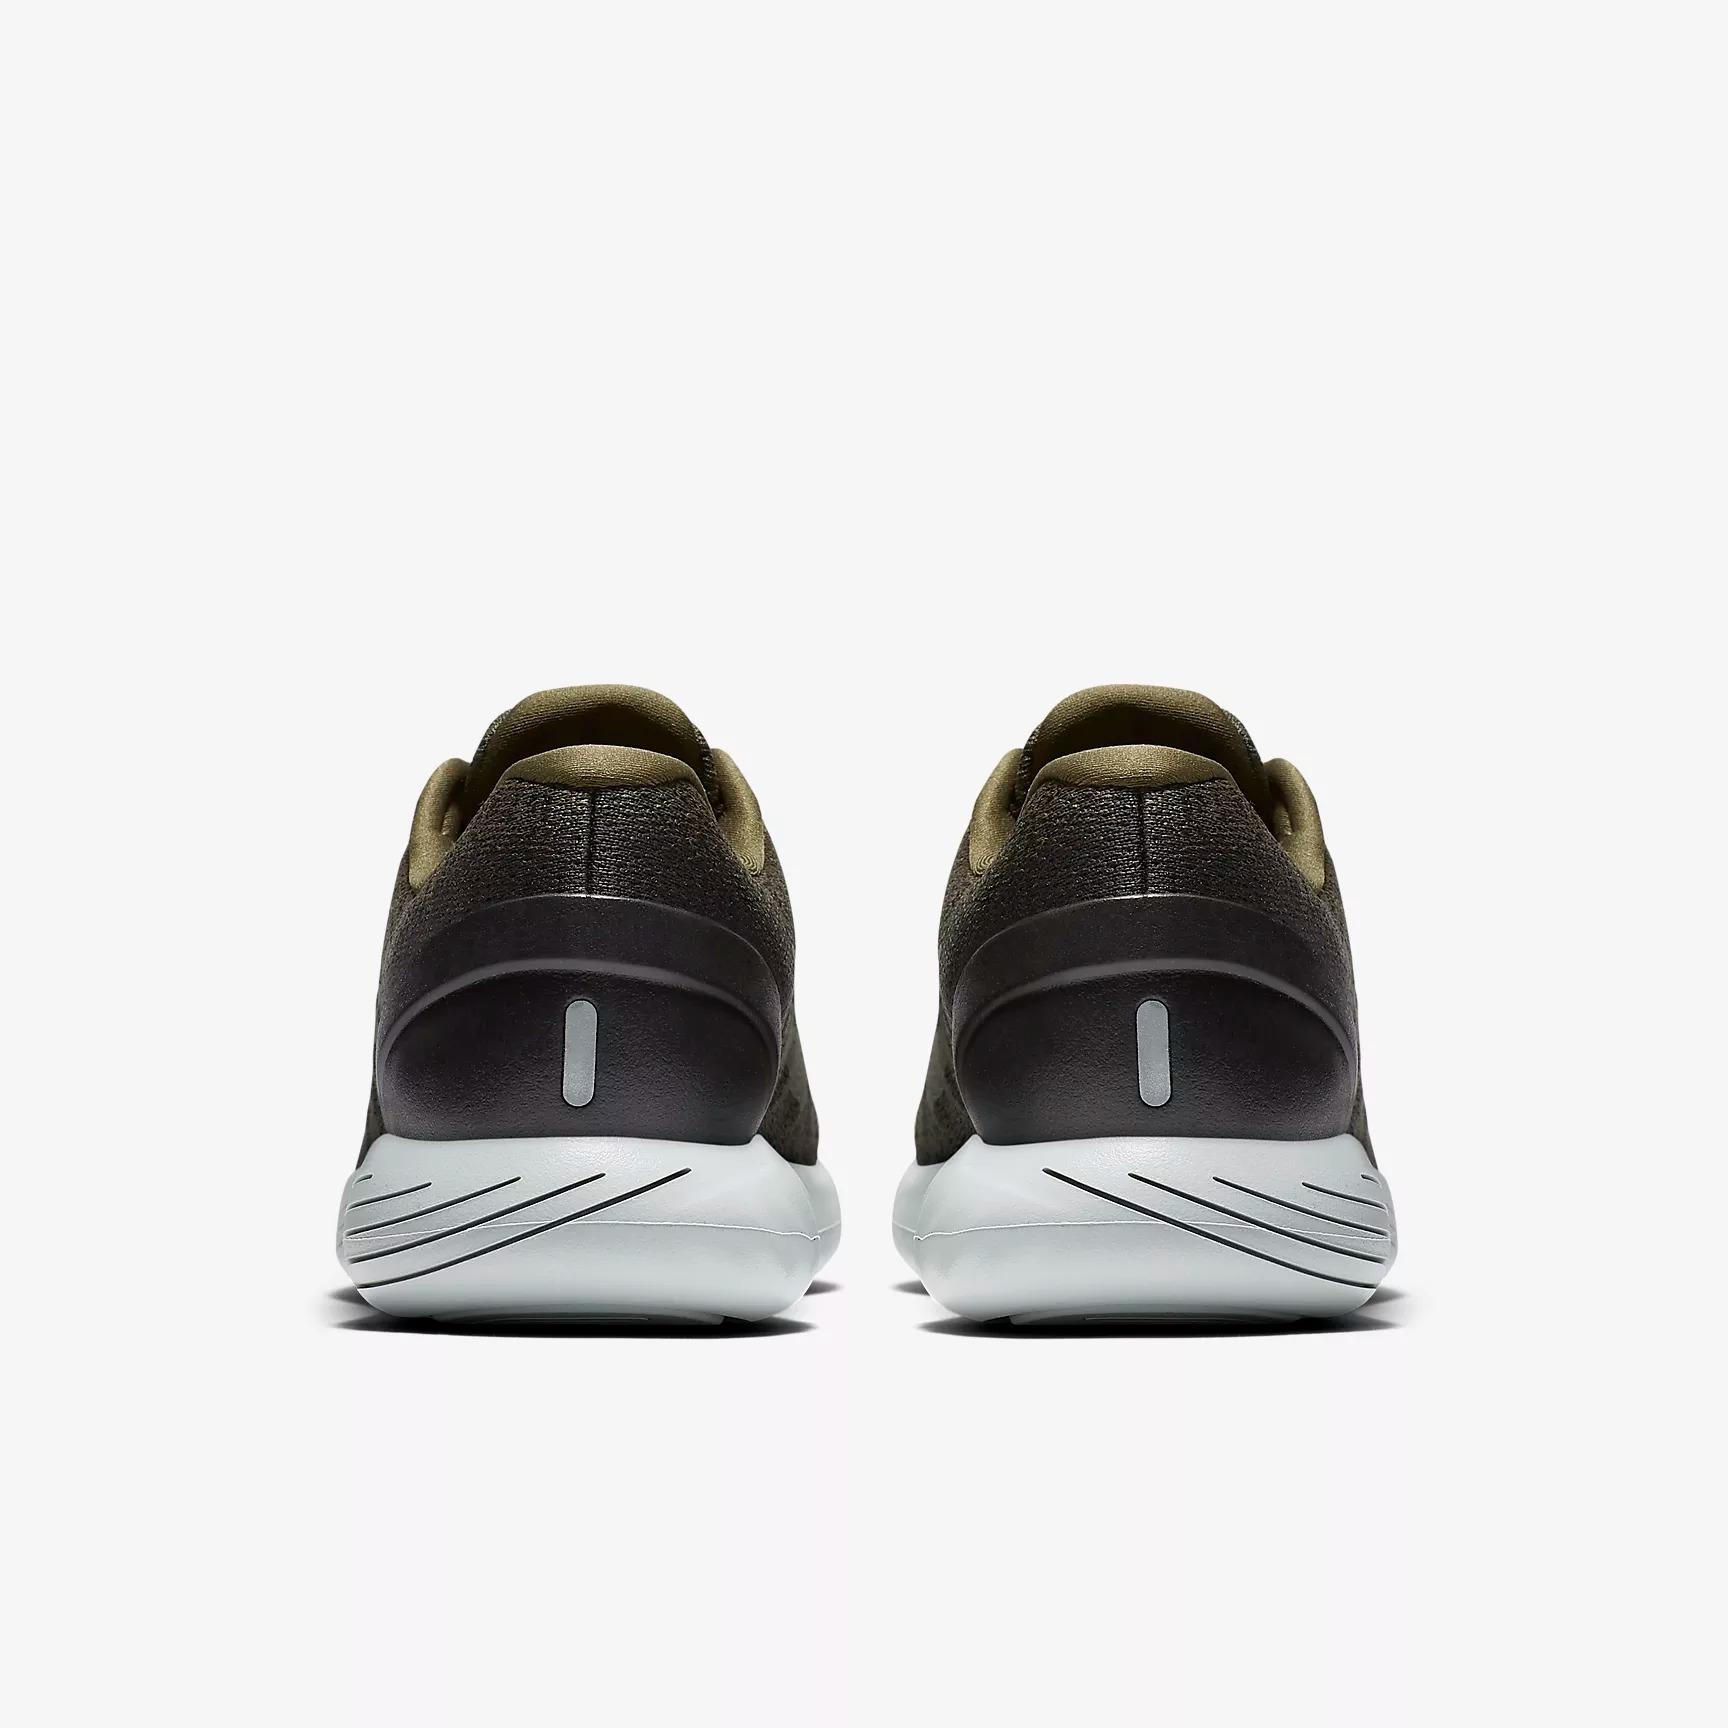 0305e0019 Nike LunarGlide 9 Running Shoes - SPORT SHOES RUNNING SHOES ...